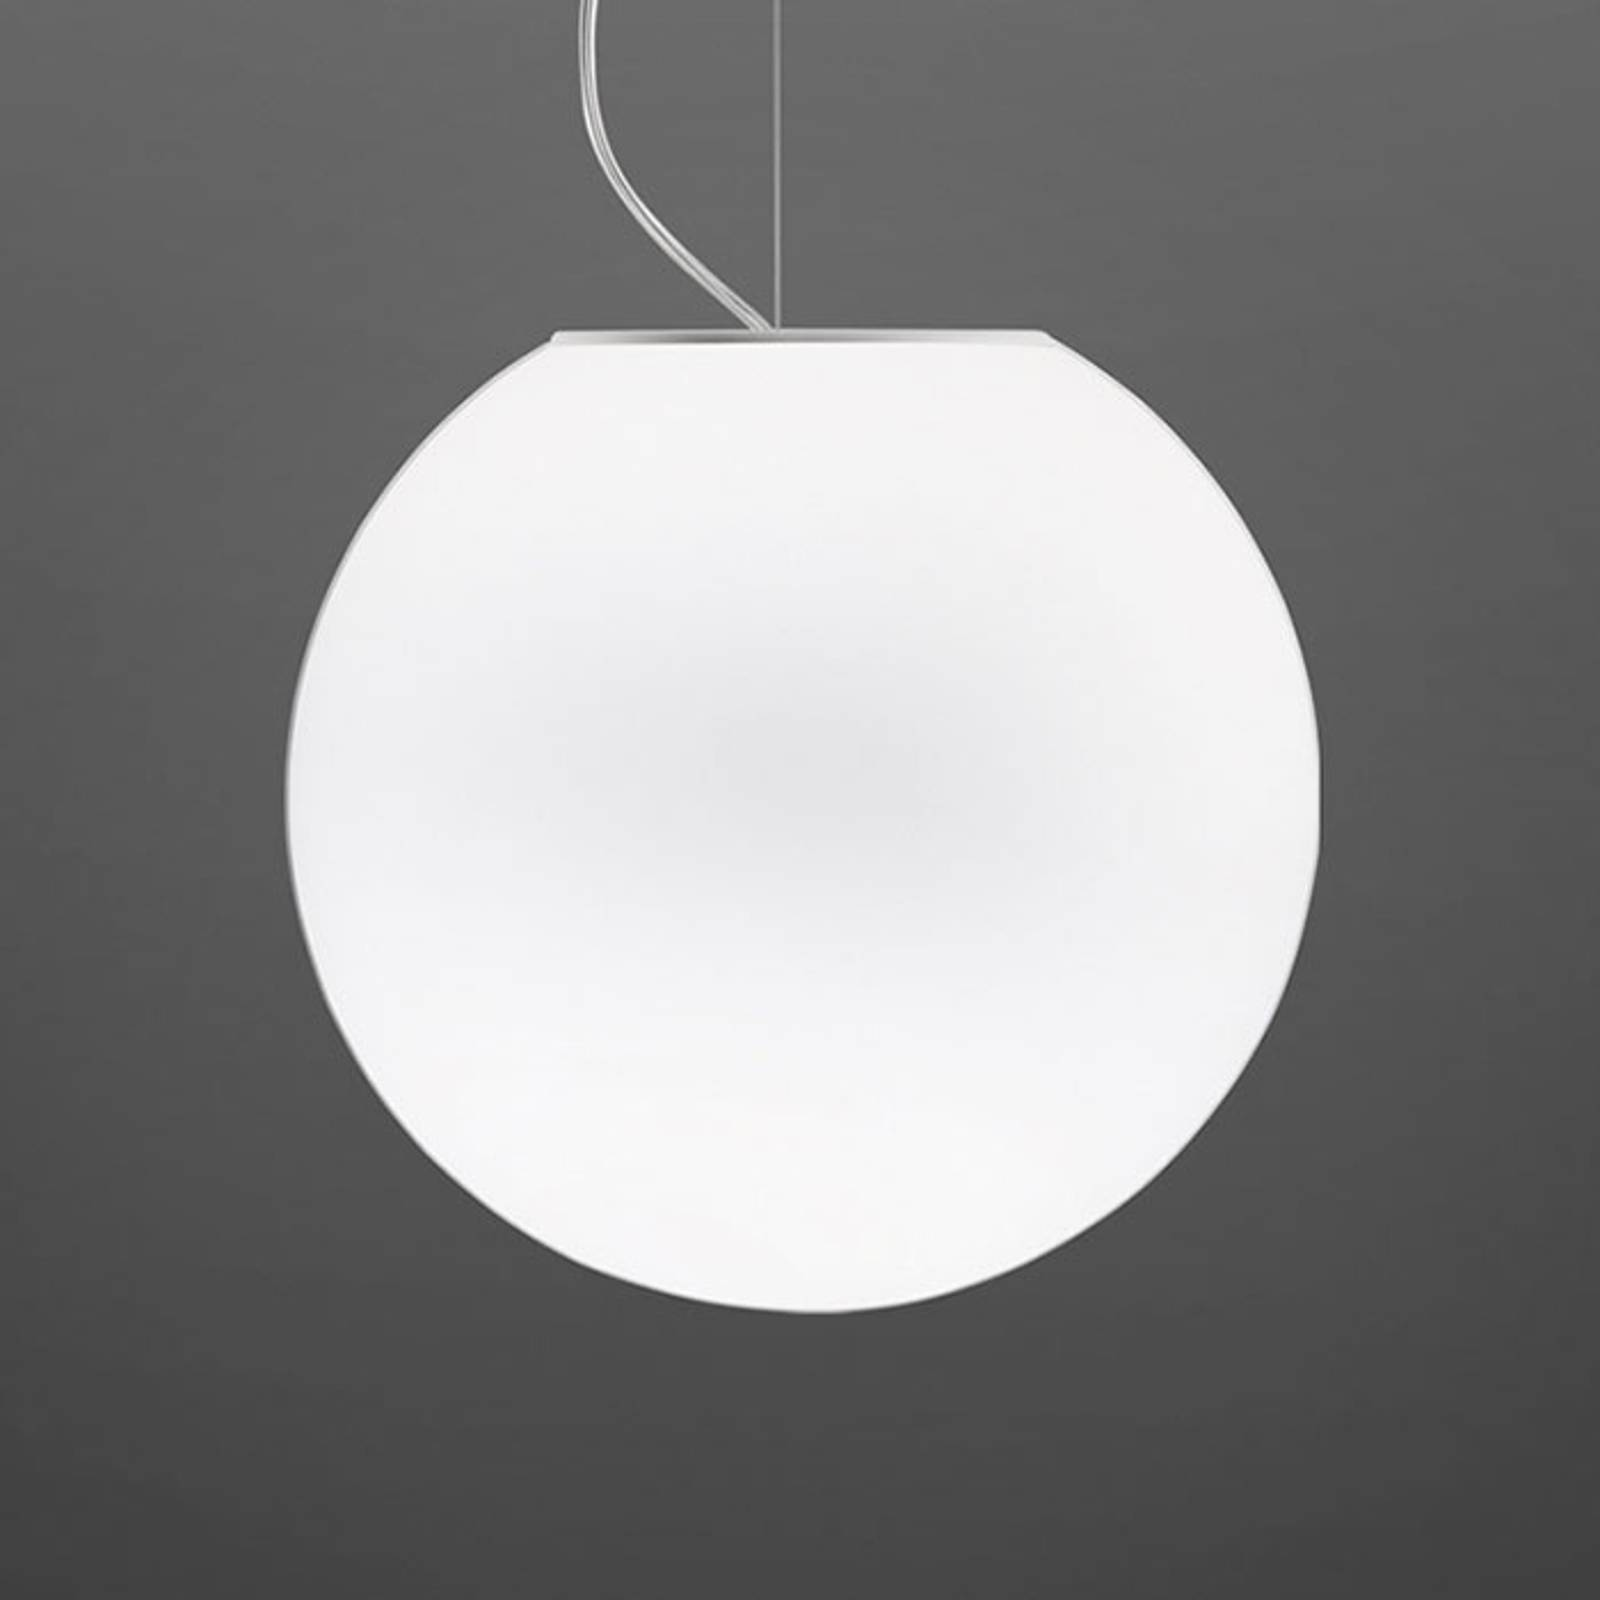 Fabbian Lumi Sfera glazen hanglamp, Ø 35 cm